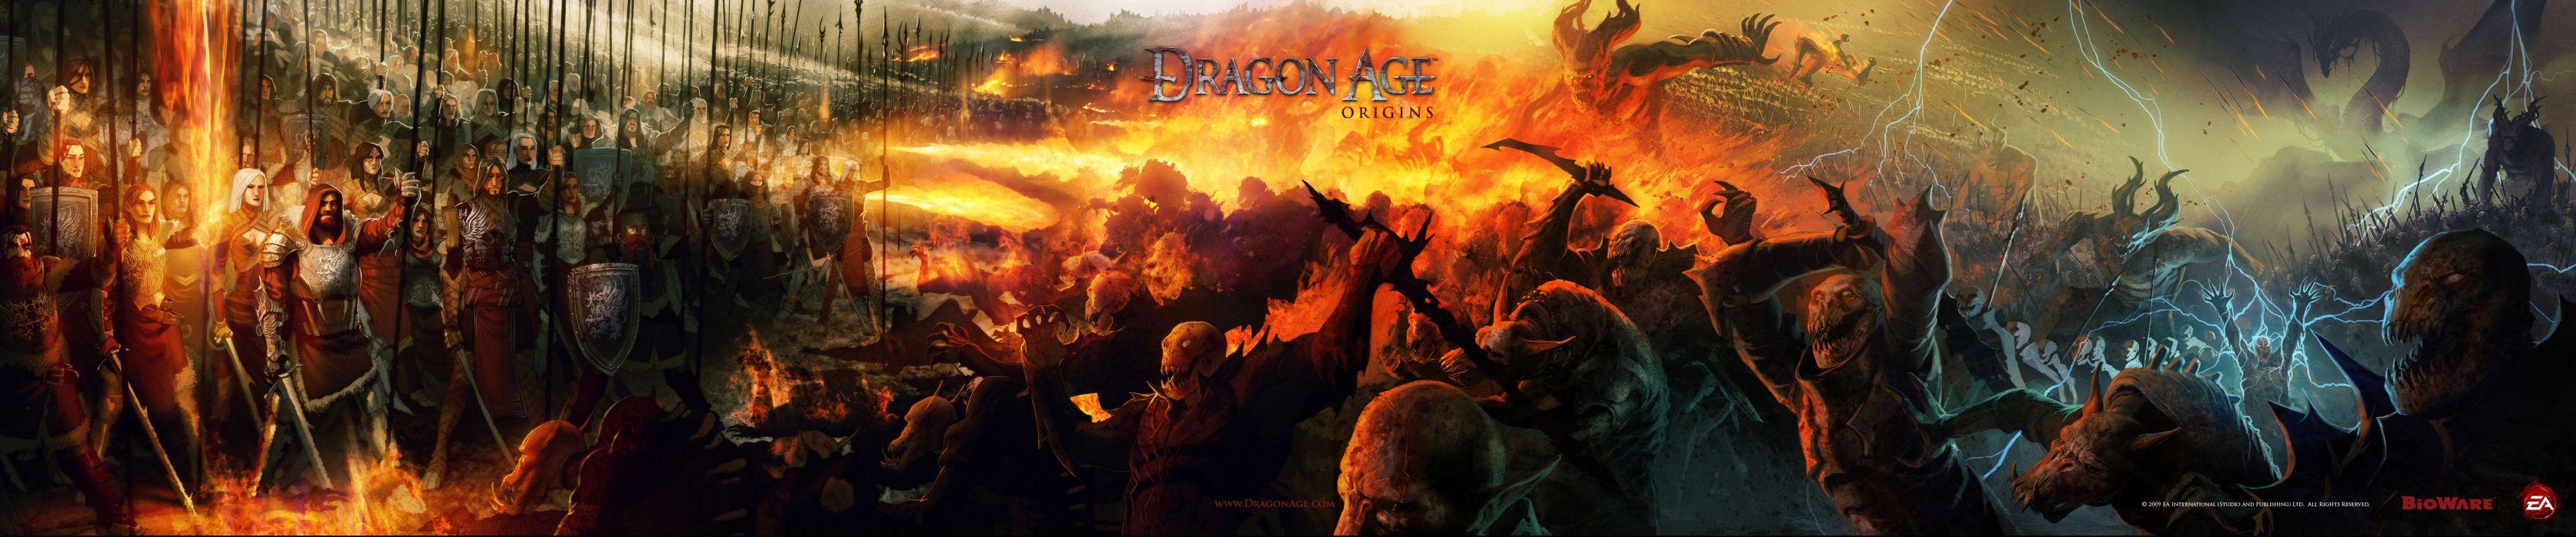 Video games dragon age wallpaper